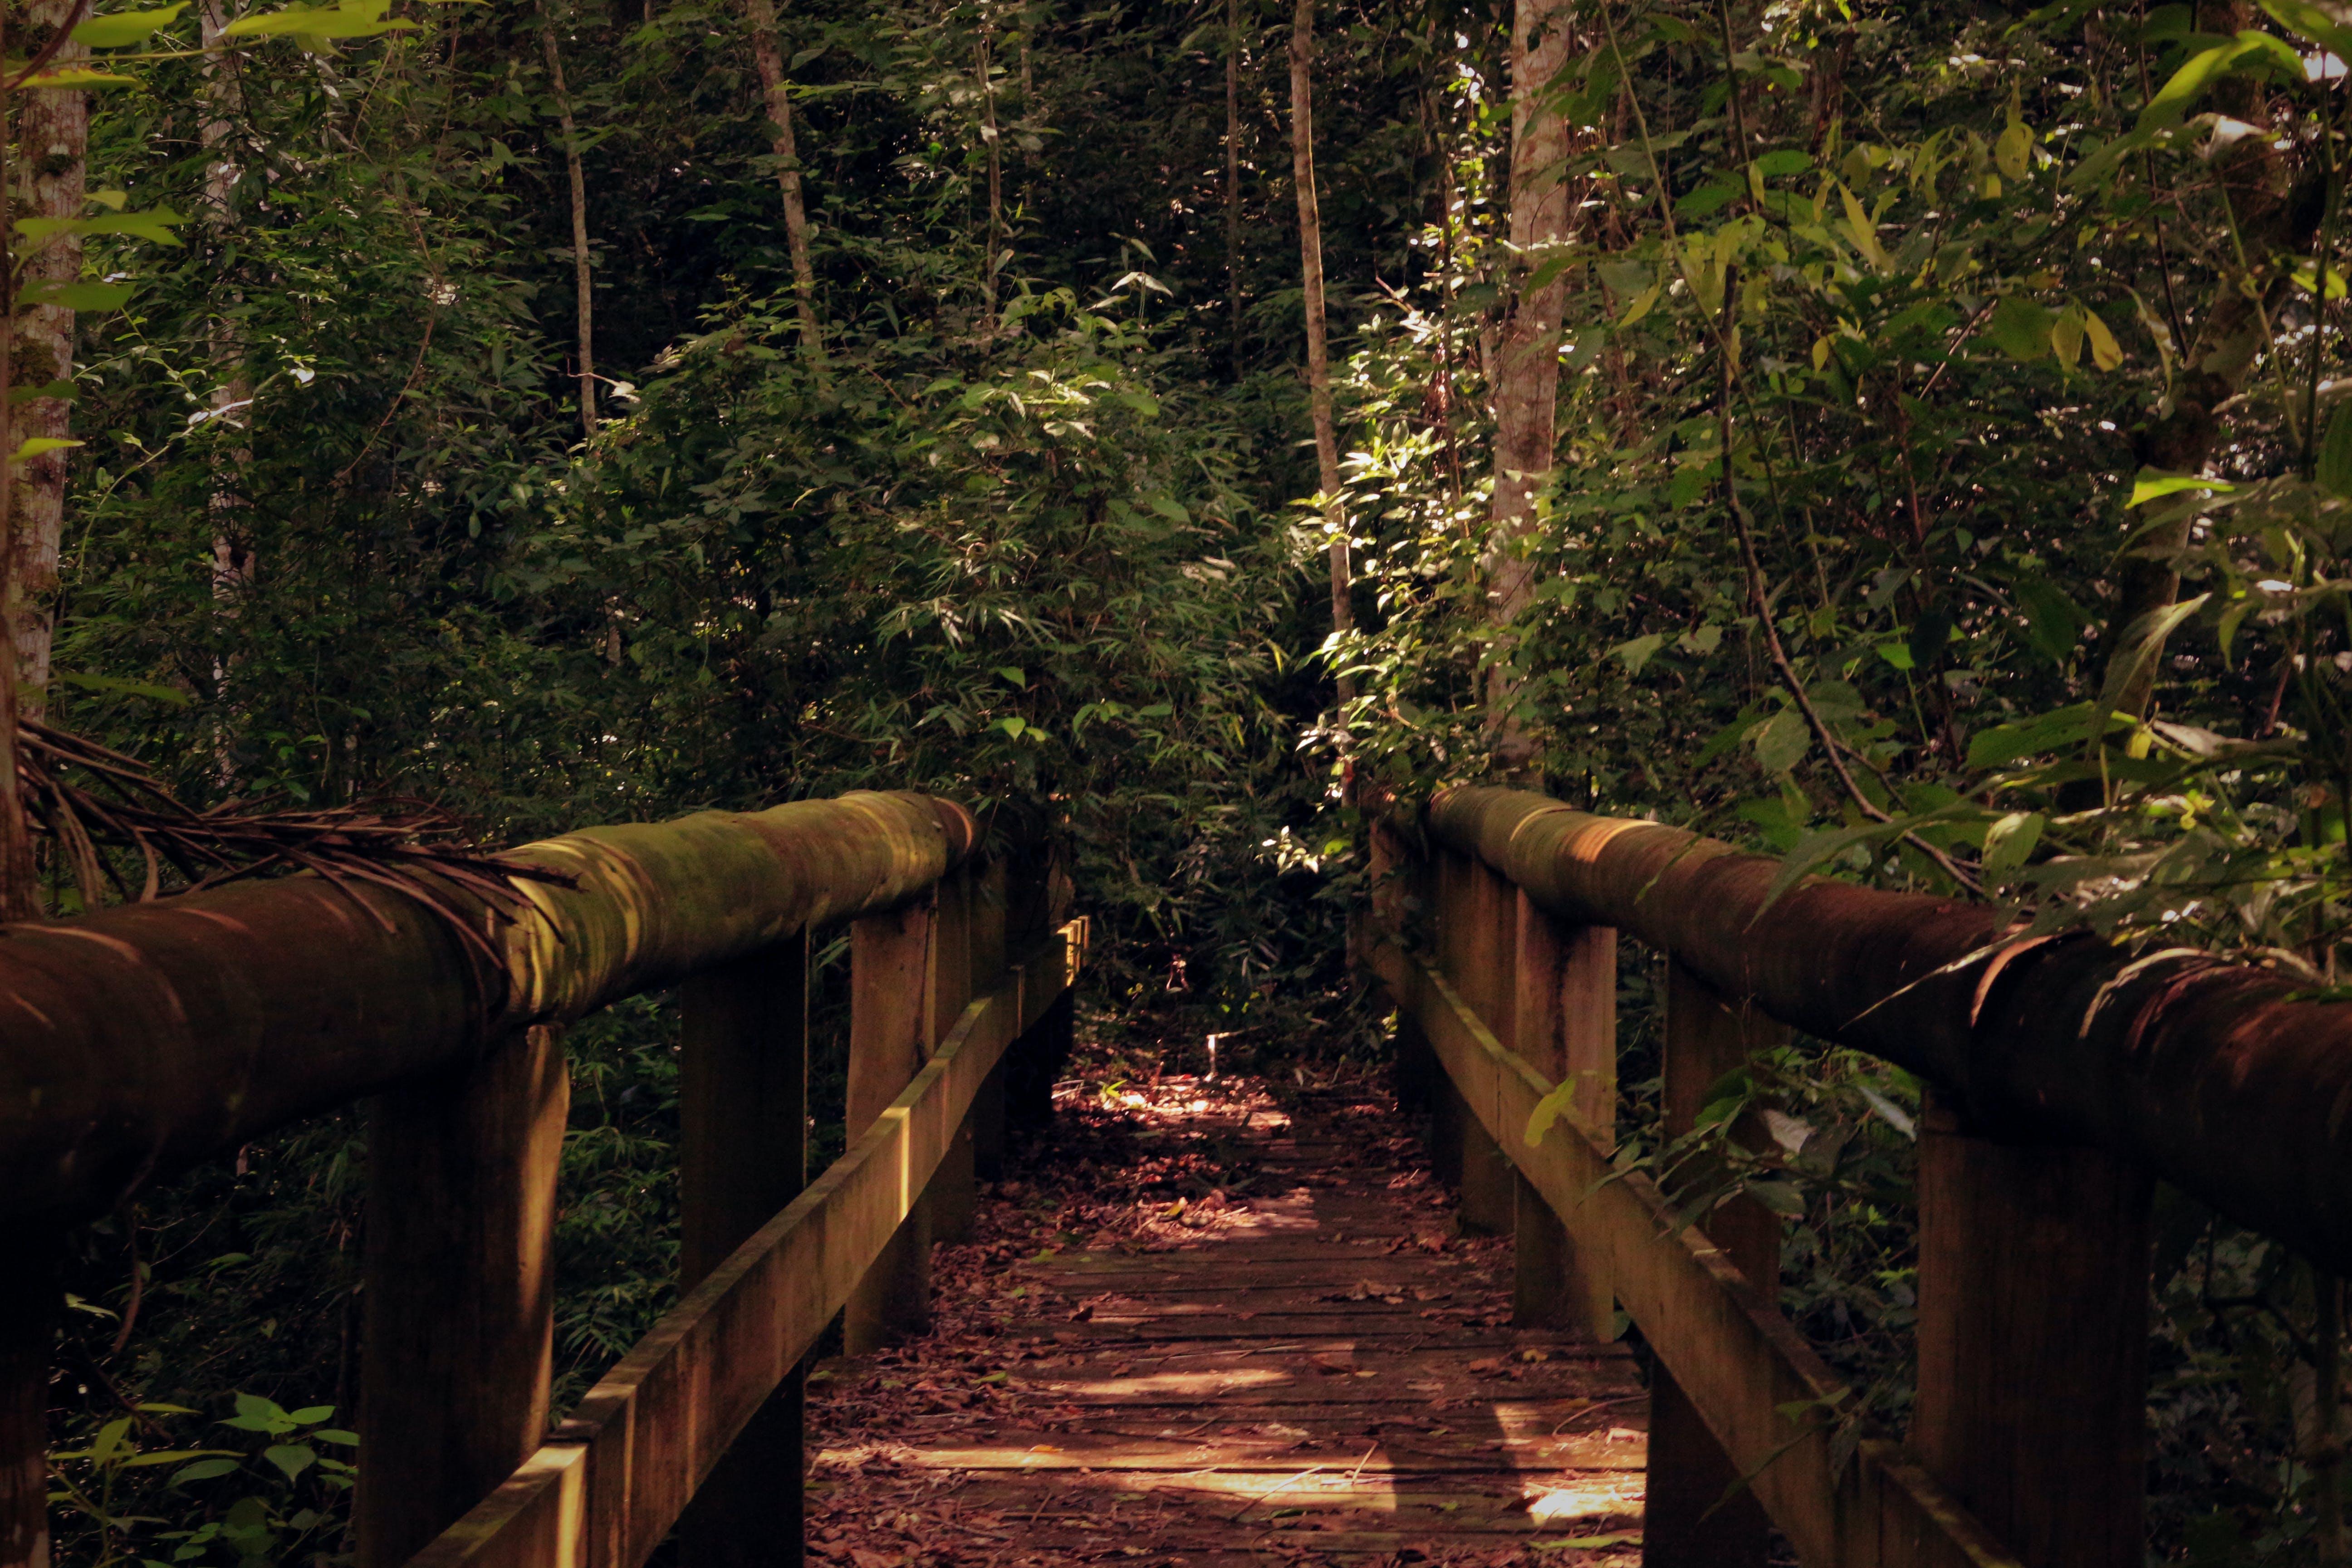 Kostenloses Stock Foto zu abenteuer, bäume, dschungel, garten